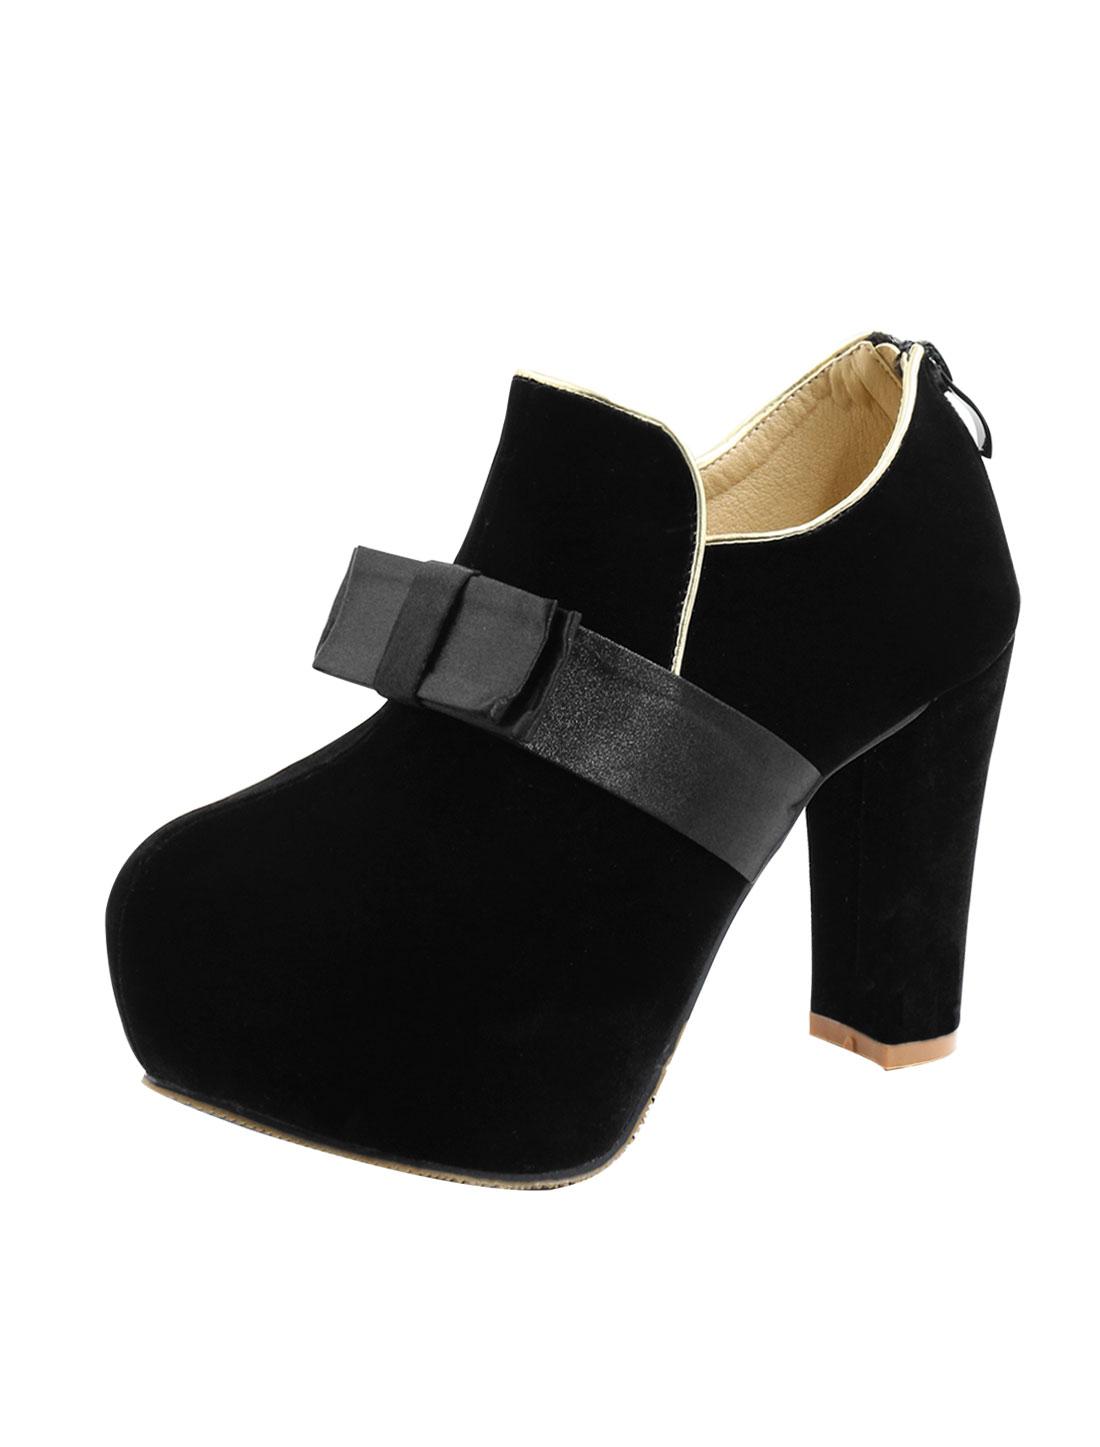 Women Bowknot Embellished Chunky Heels Platform Shoes Black US 8.5